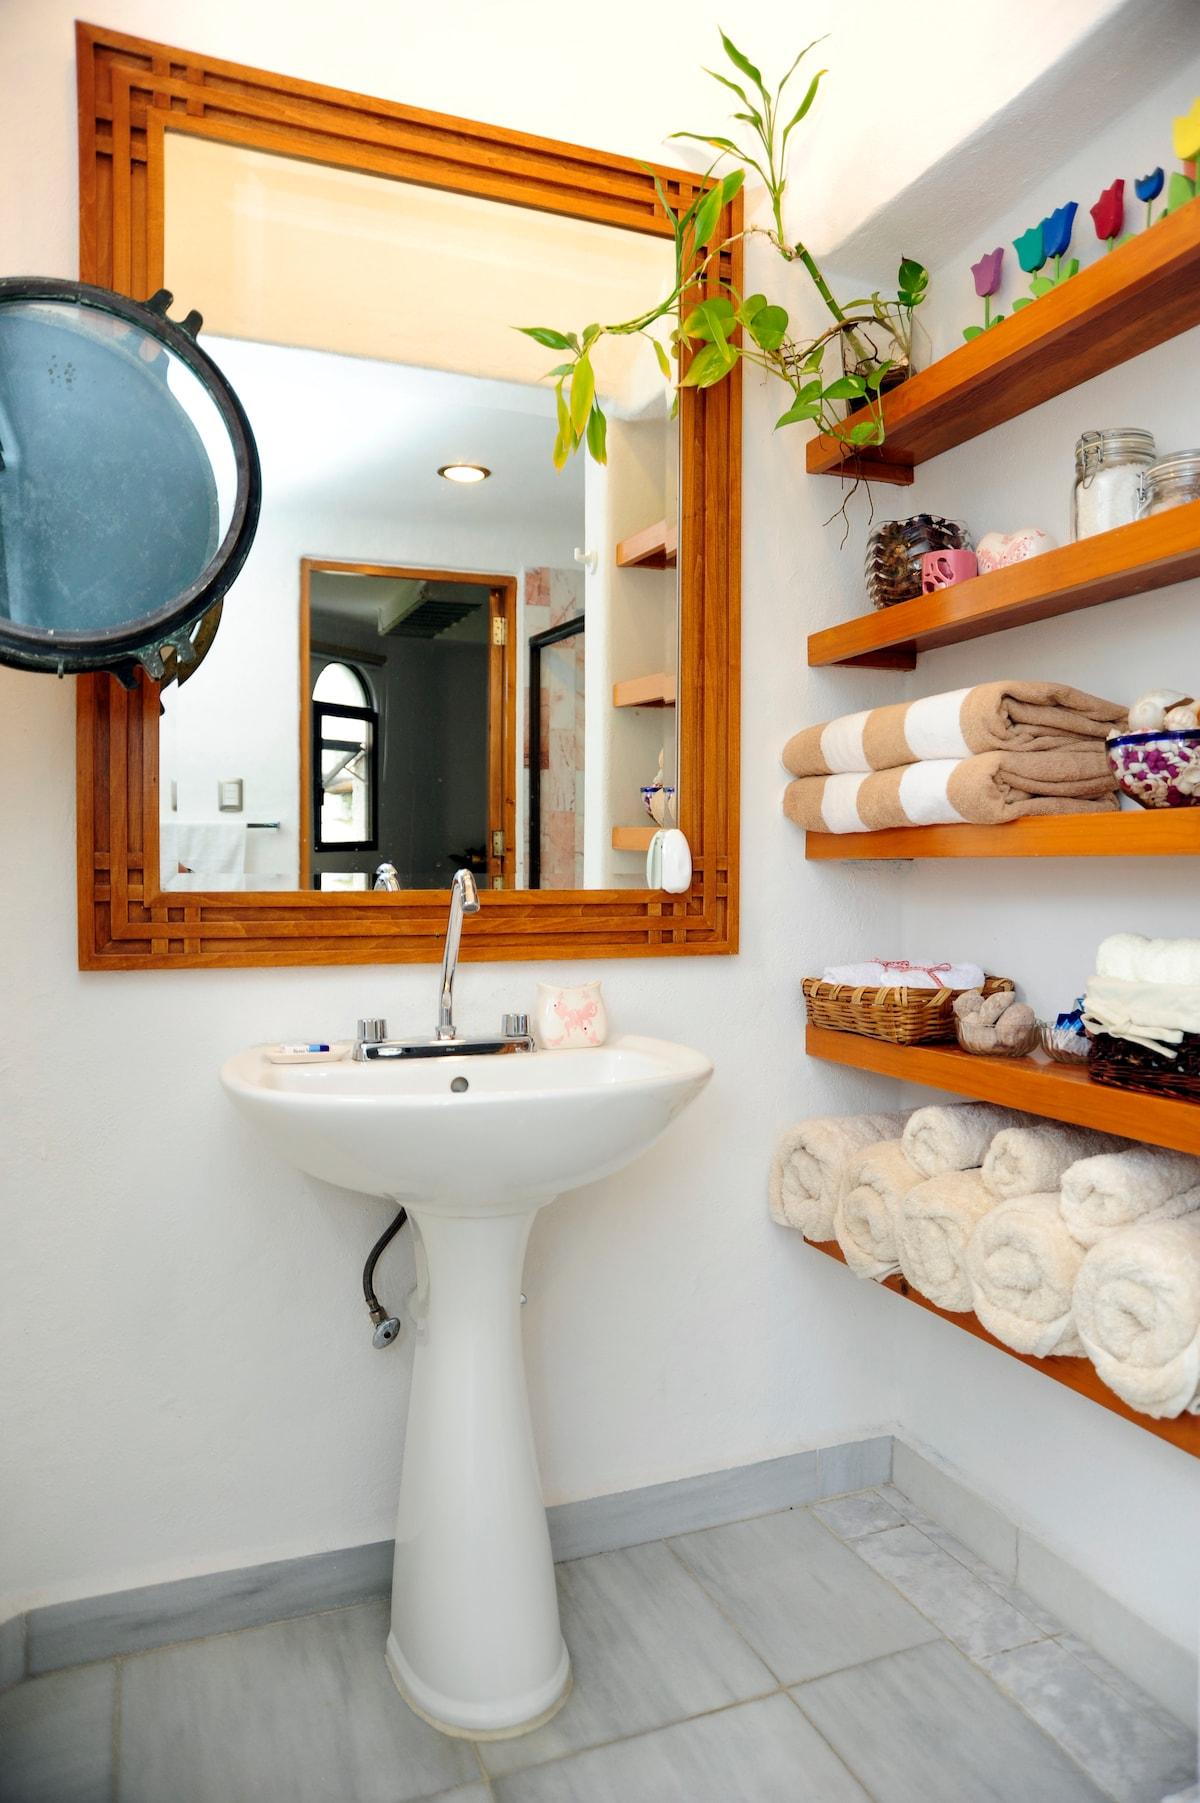 Towels, soap, shampoo, hairdryer, toilet paper, tissues etc...